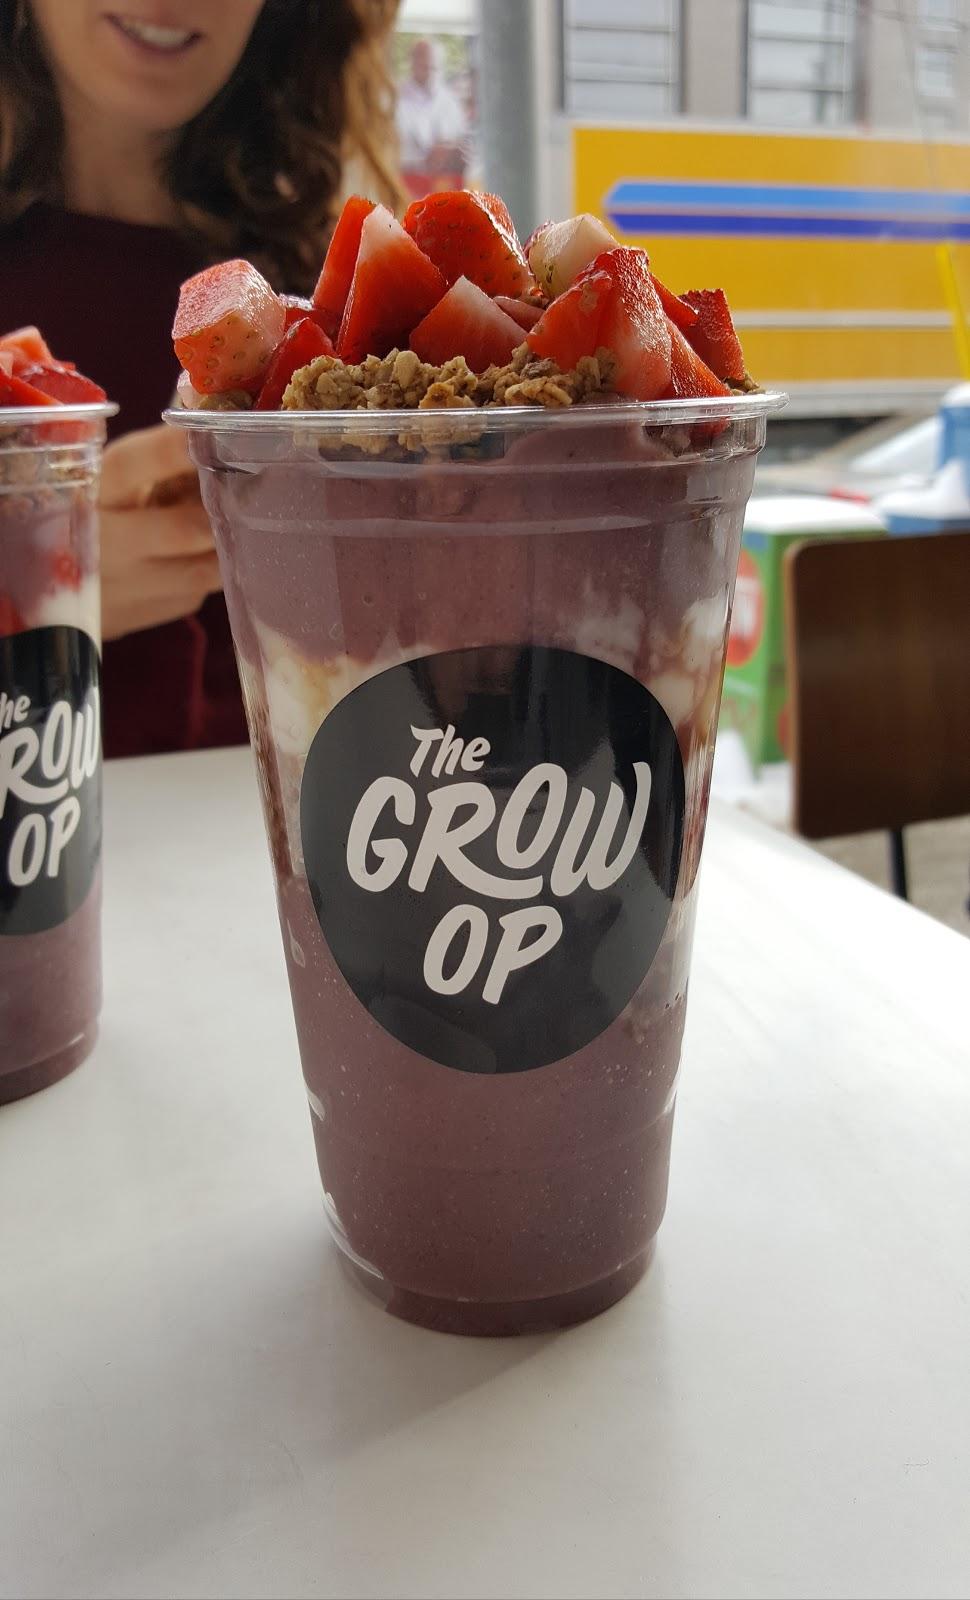 The Grow-Op Juice Bar & Eatery | cafe | 222 Ossington Ave, Toronto, ON M6J 2Z9, Canada | 4165329999 OR +1 416-532-9999